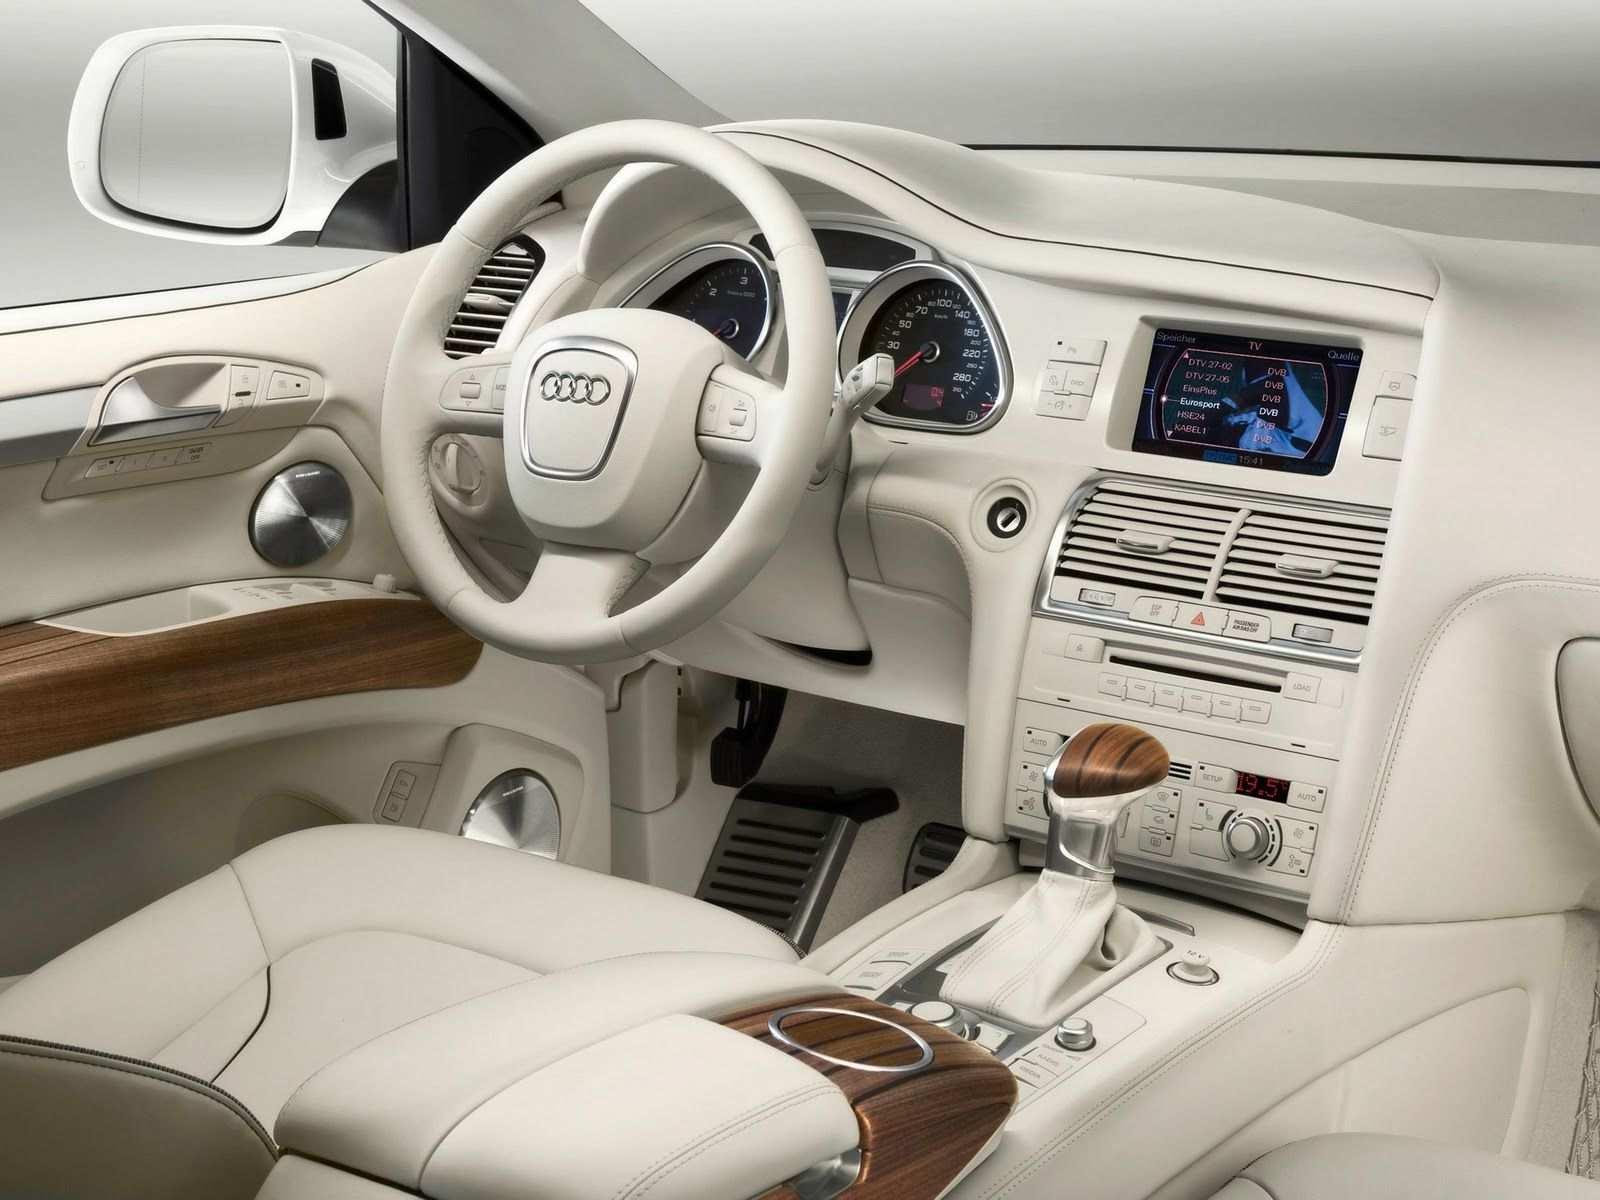 28 Concept of Audi Tt 2020 Interior Reviews for Audi Tt 2020 Interior